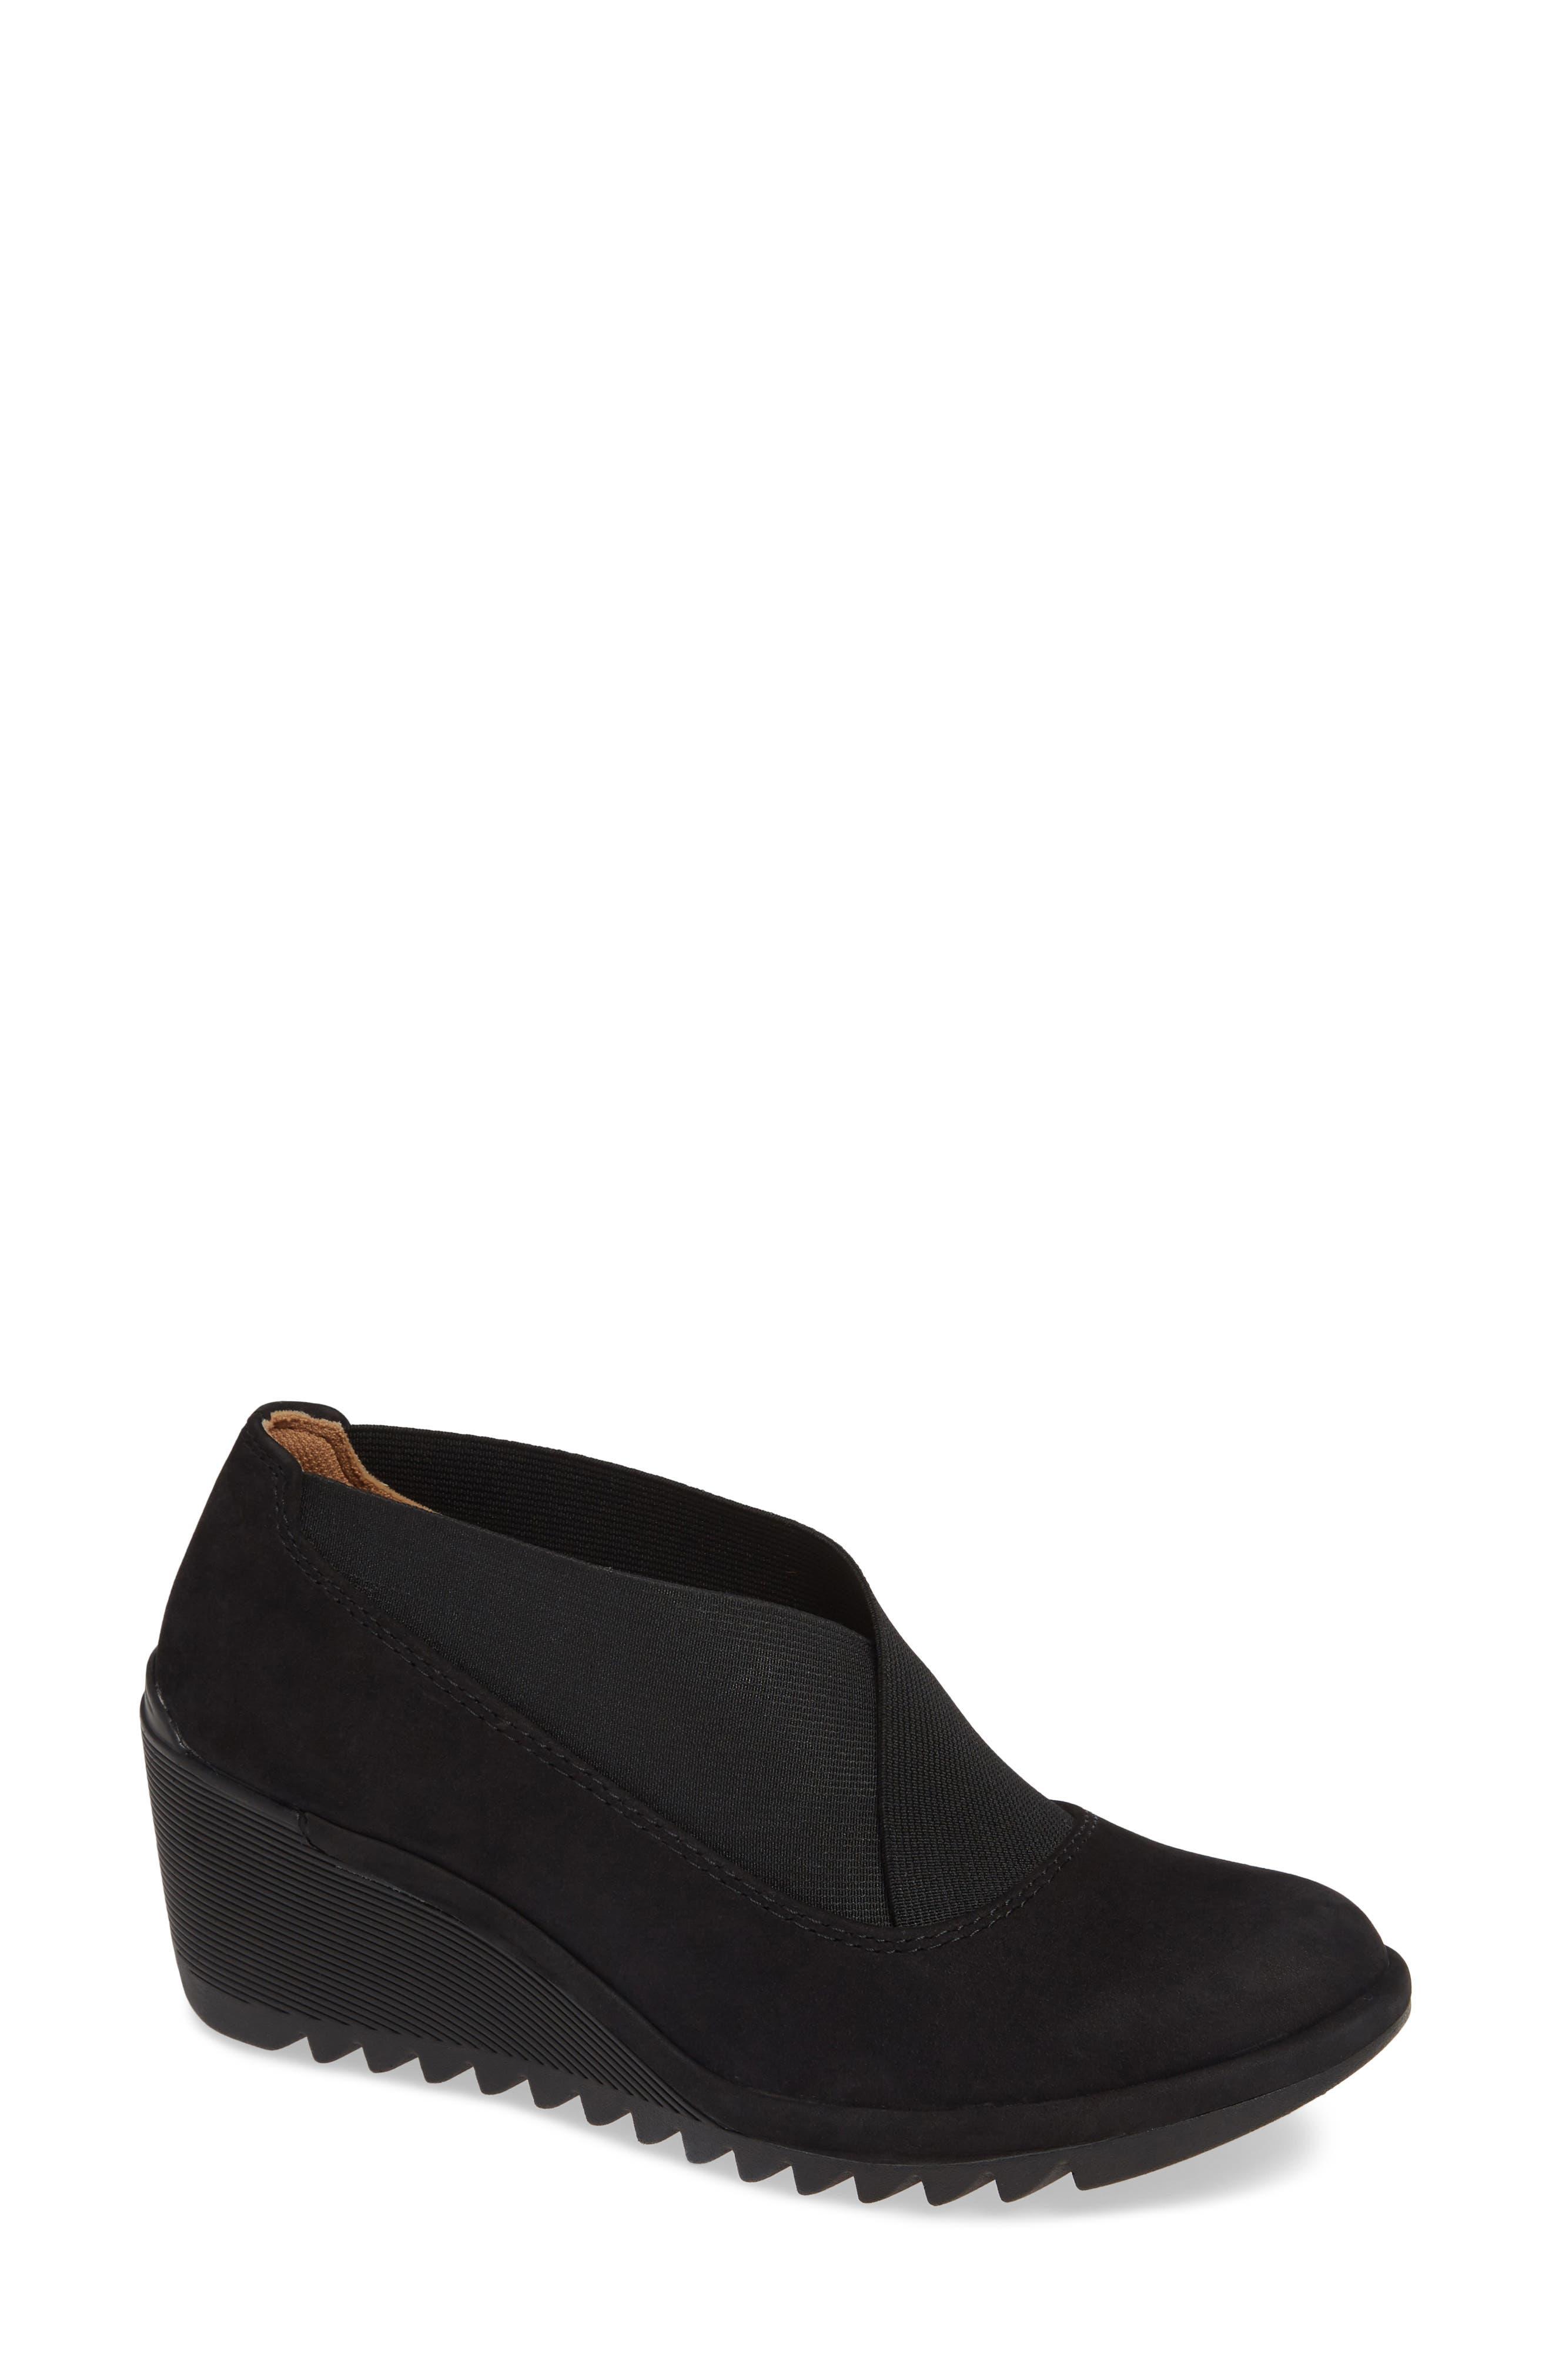 Comfortiva Ashford Ankle Bootie- Black